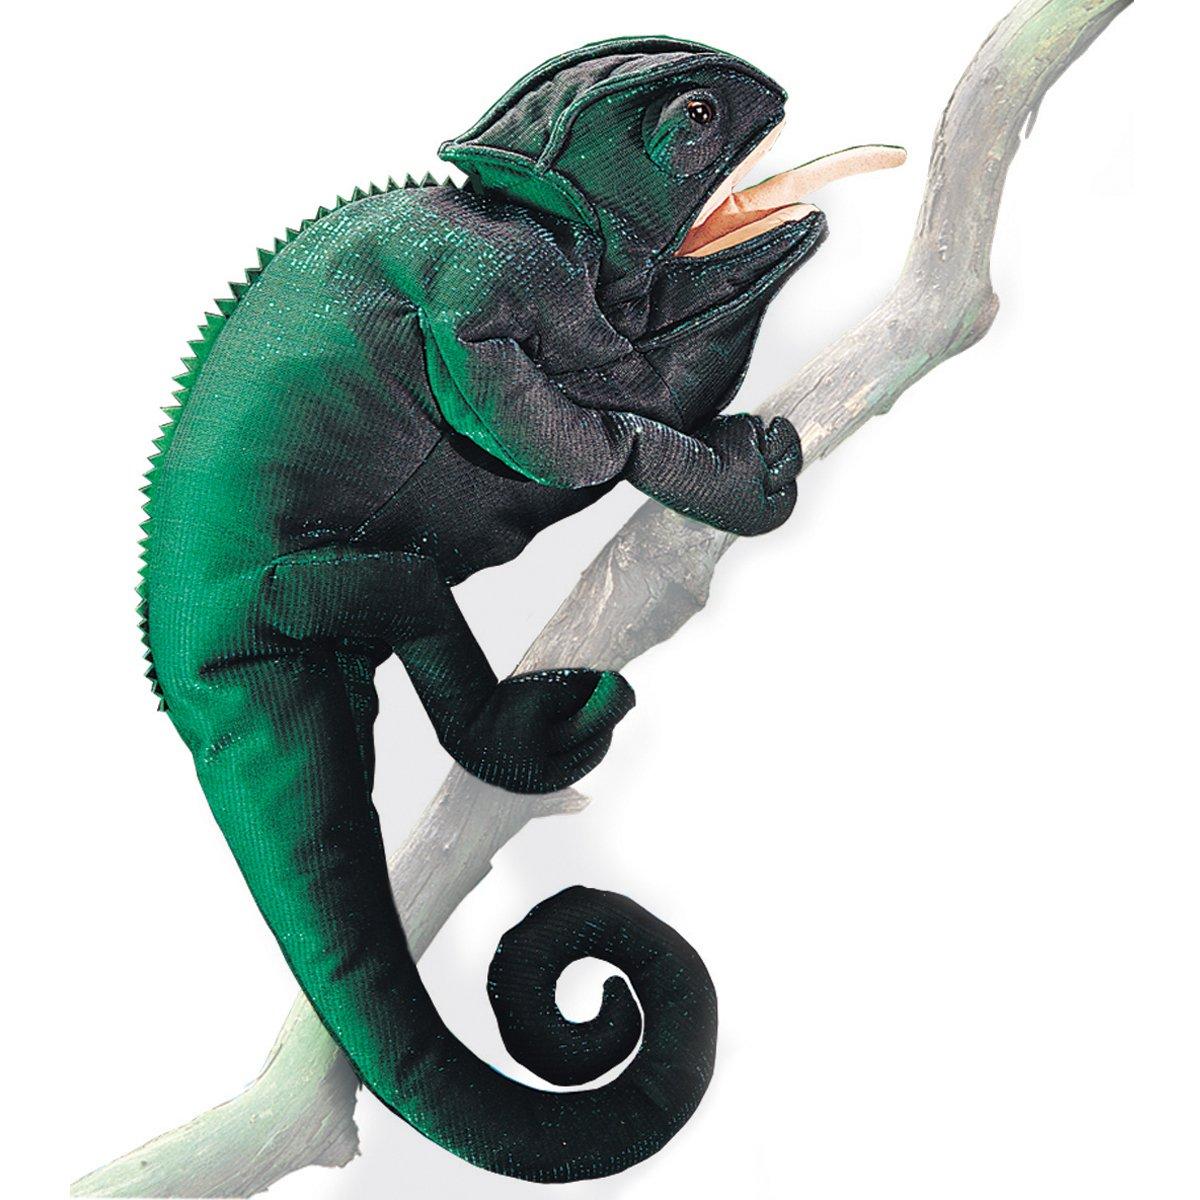 Folkmanis Chameleon Hand Puppet Folkmanis Puppets 2215